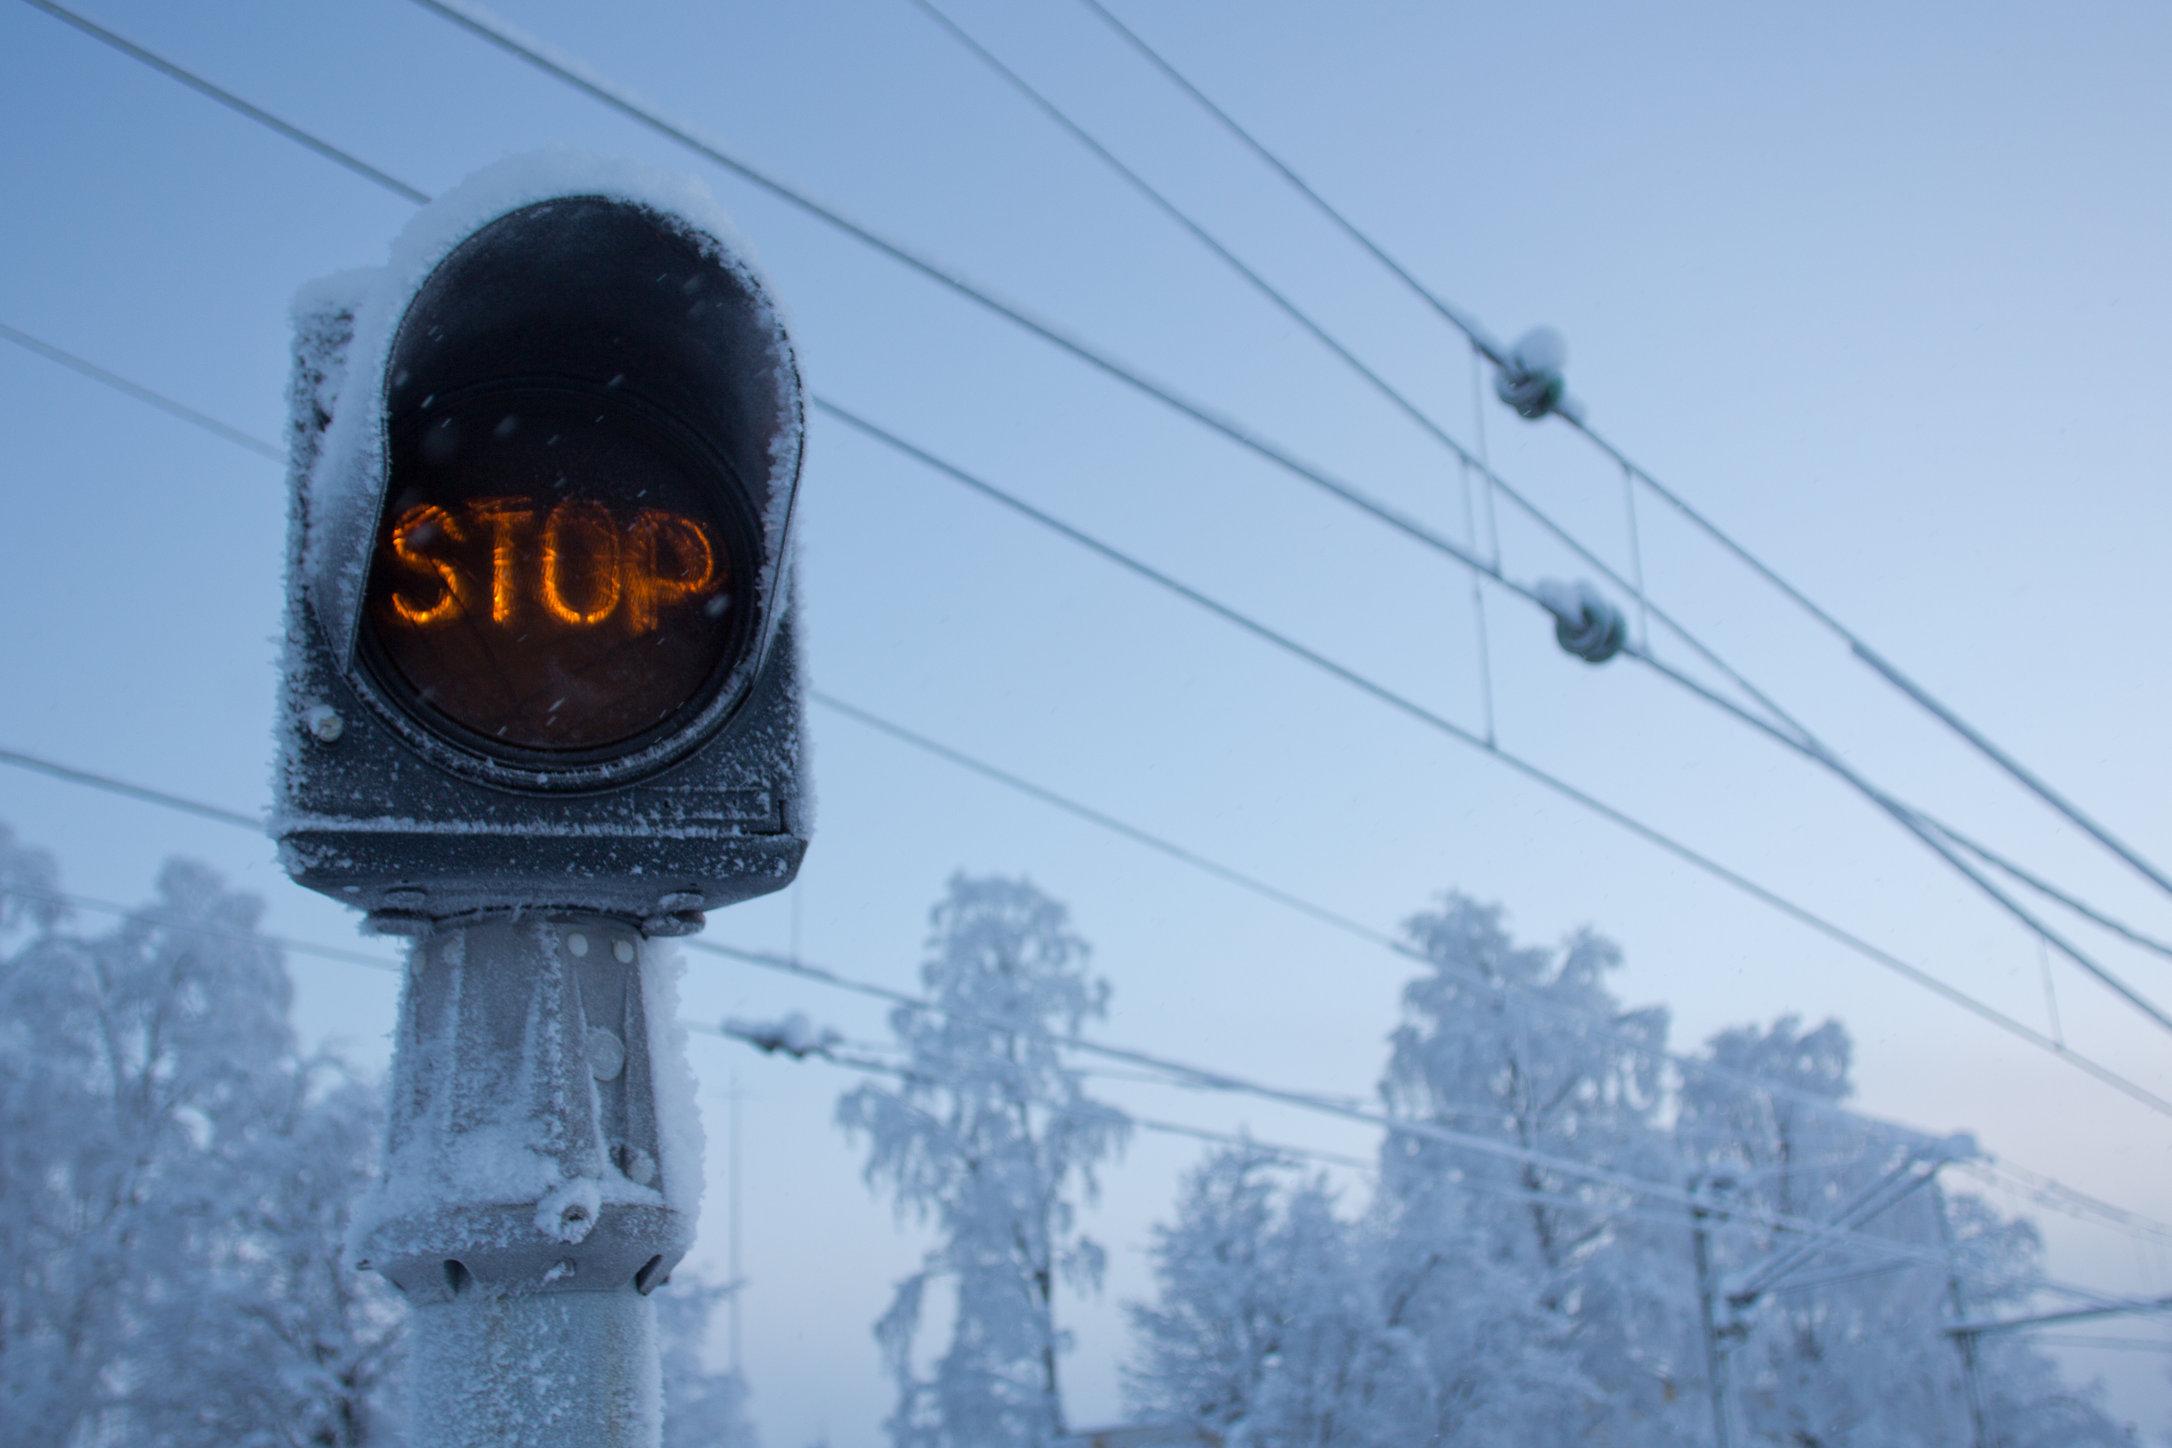 Stop sign_8401677713_o.jpg